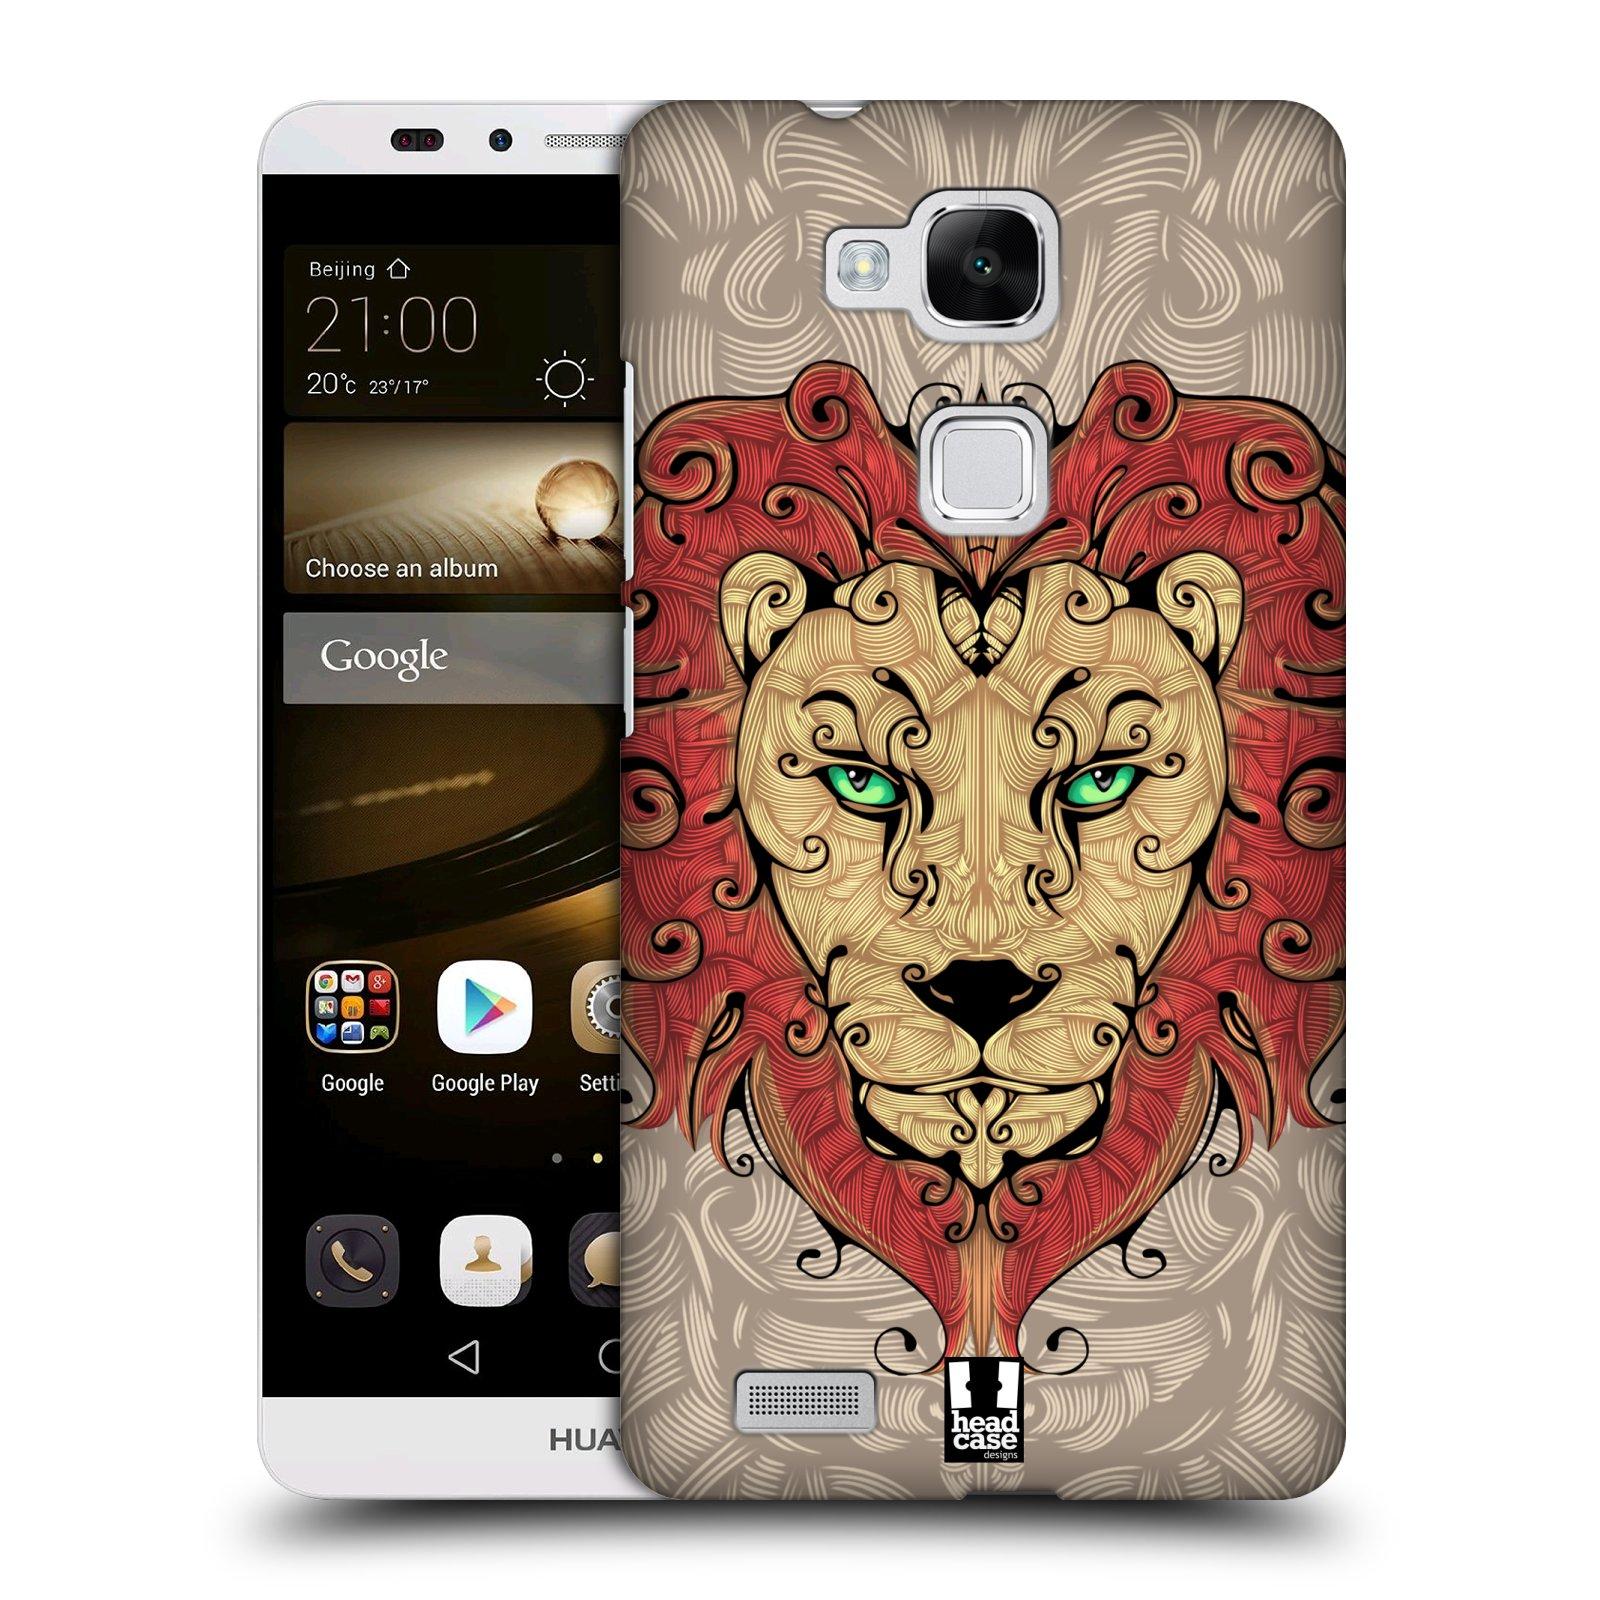 HEAD CASE plastový obal na mobil Huawei Mate 7 vzor kudrlinky zvíře lev